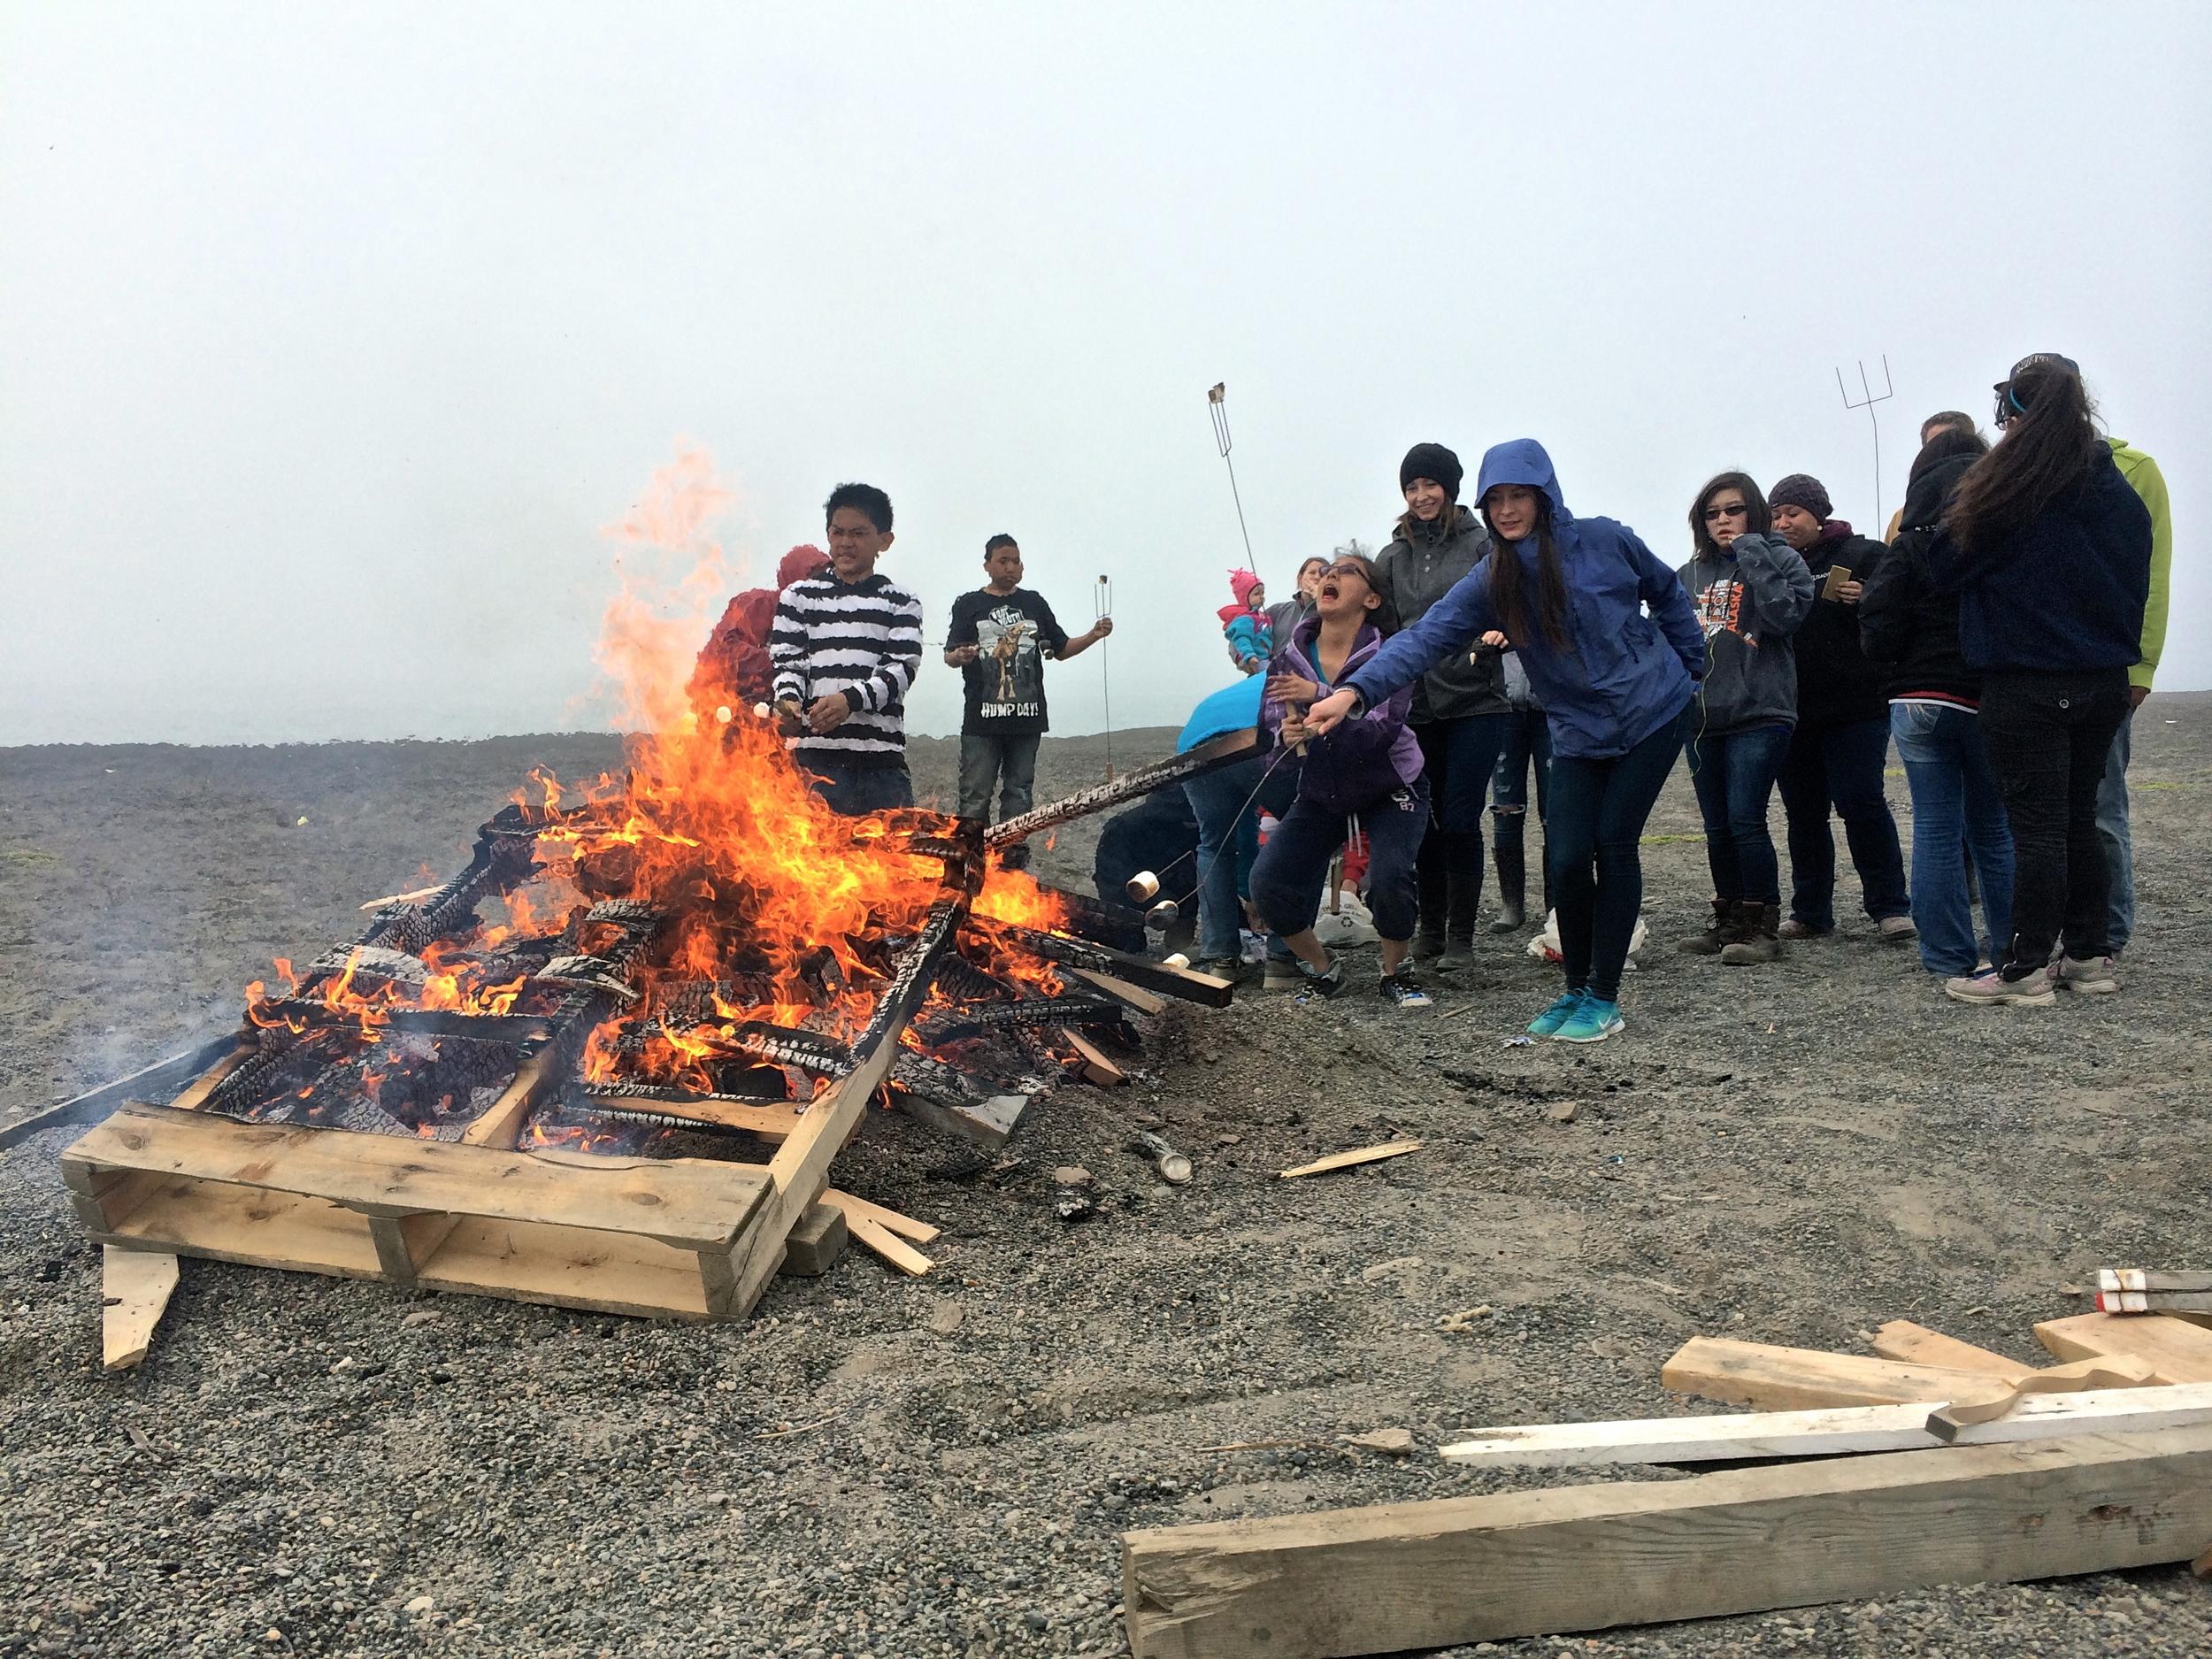 Marshmallow roasting time!